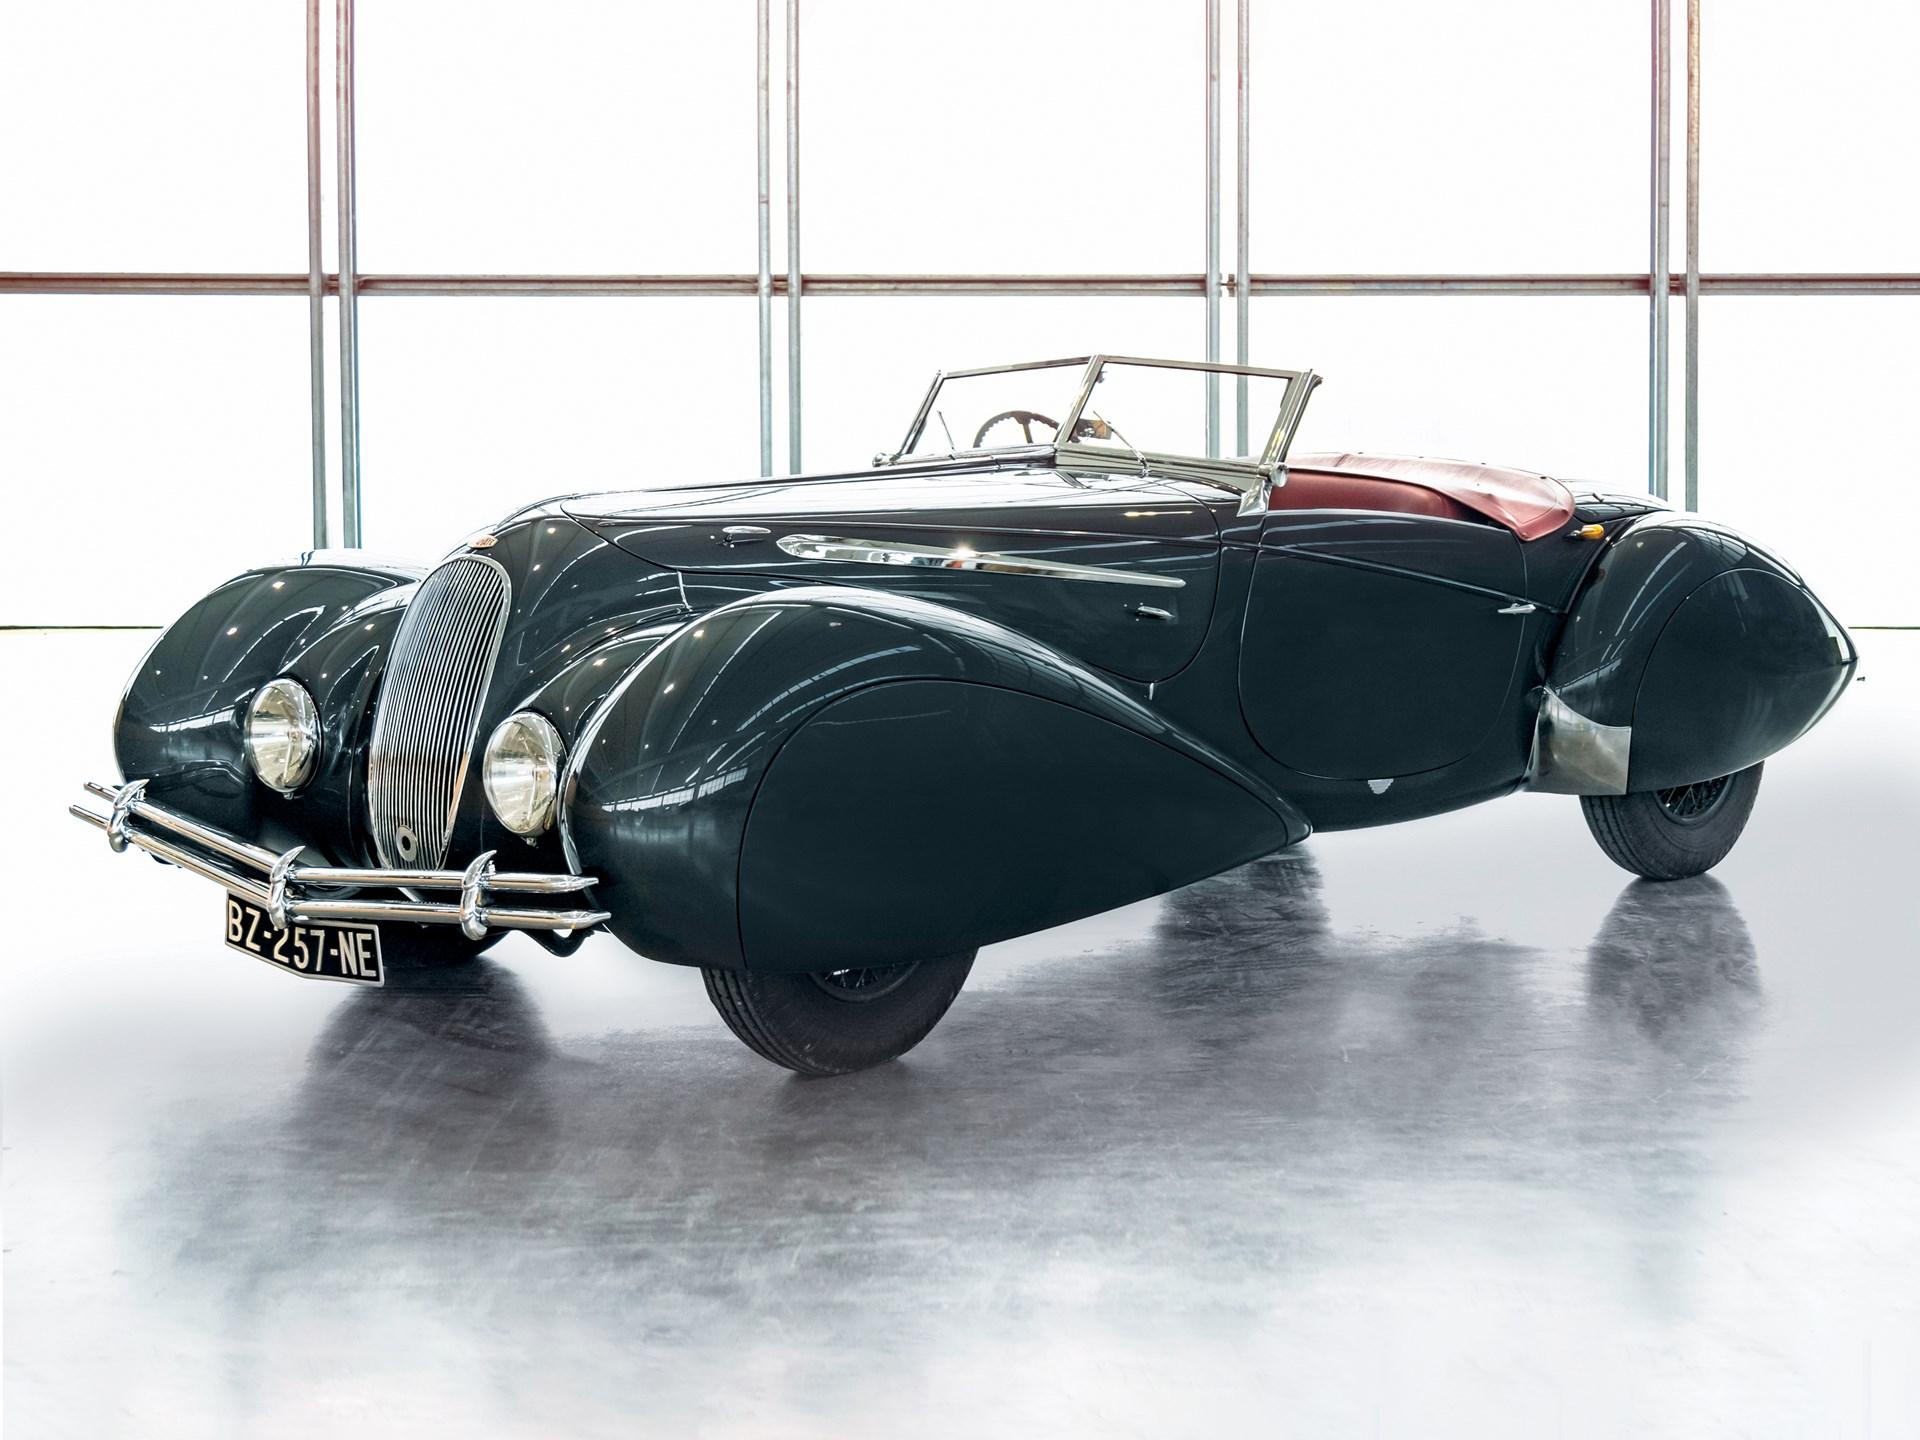 1939 Delahaye 135 Roadster in the style of Figoni